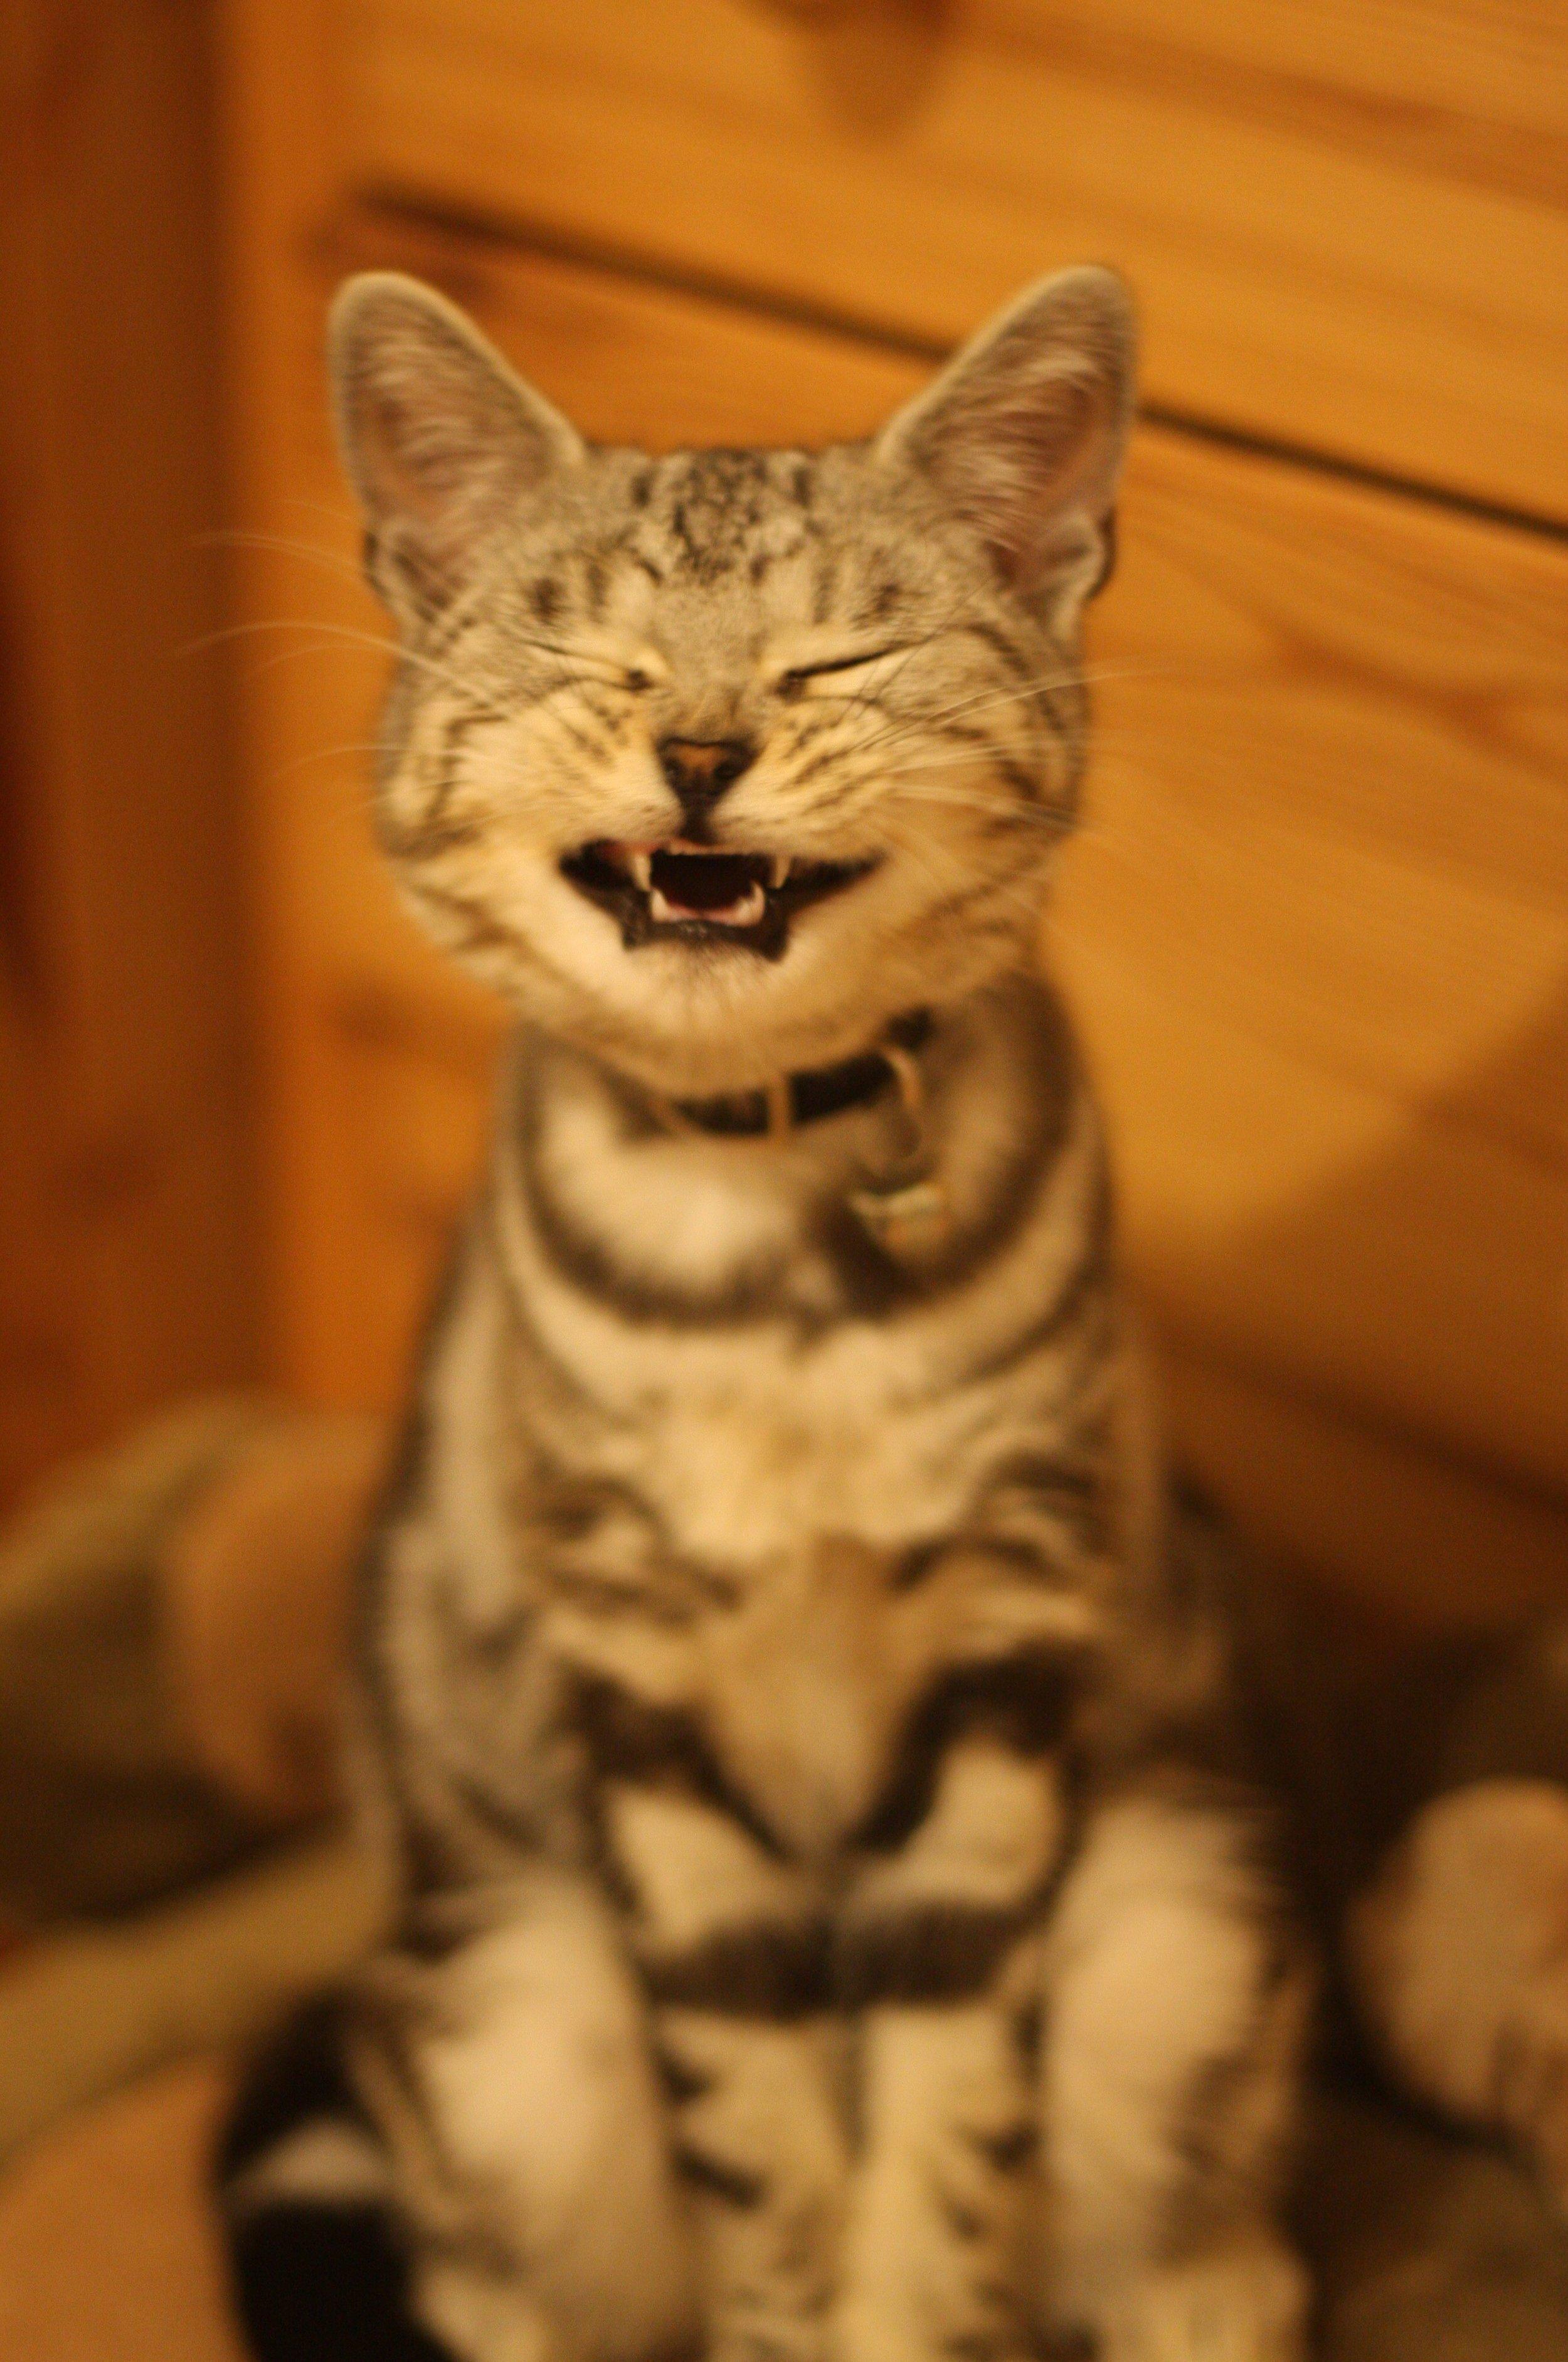 sneezing_cat.jpg